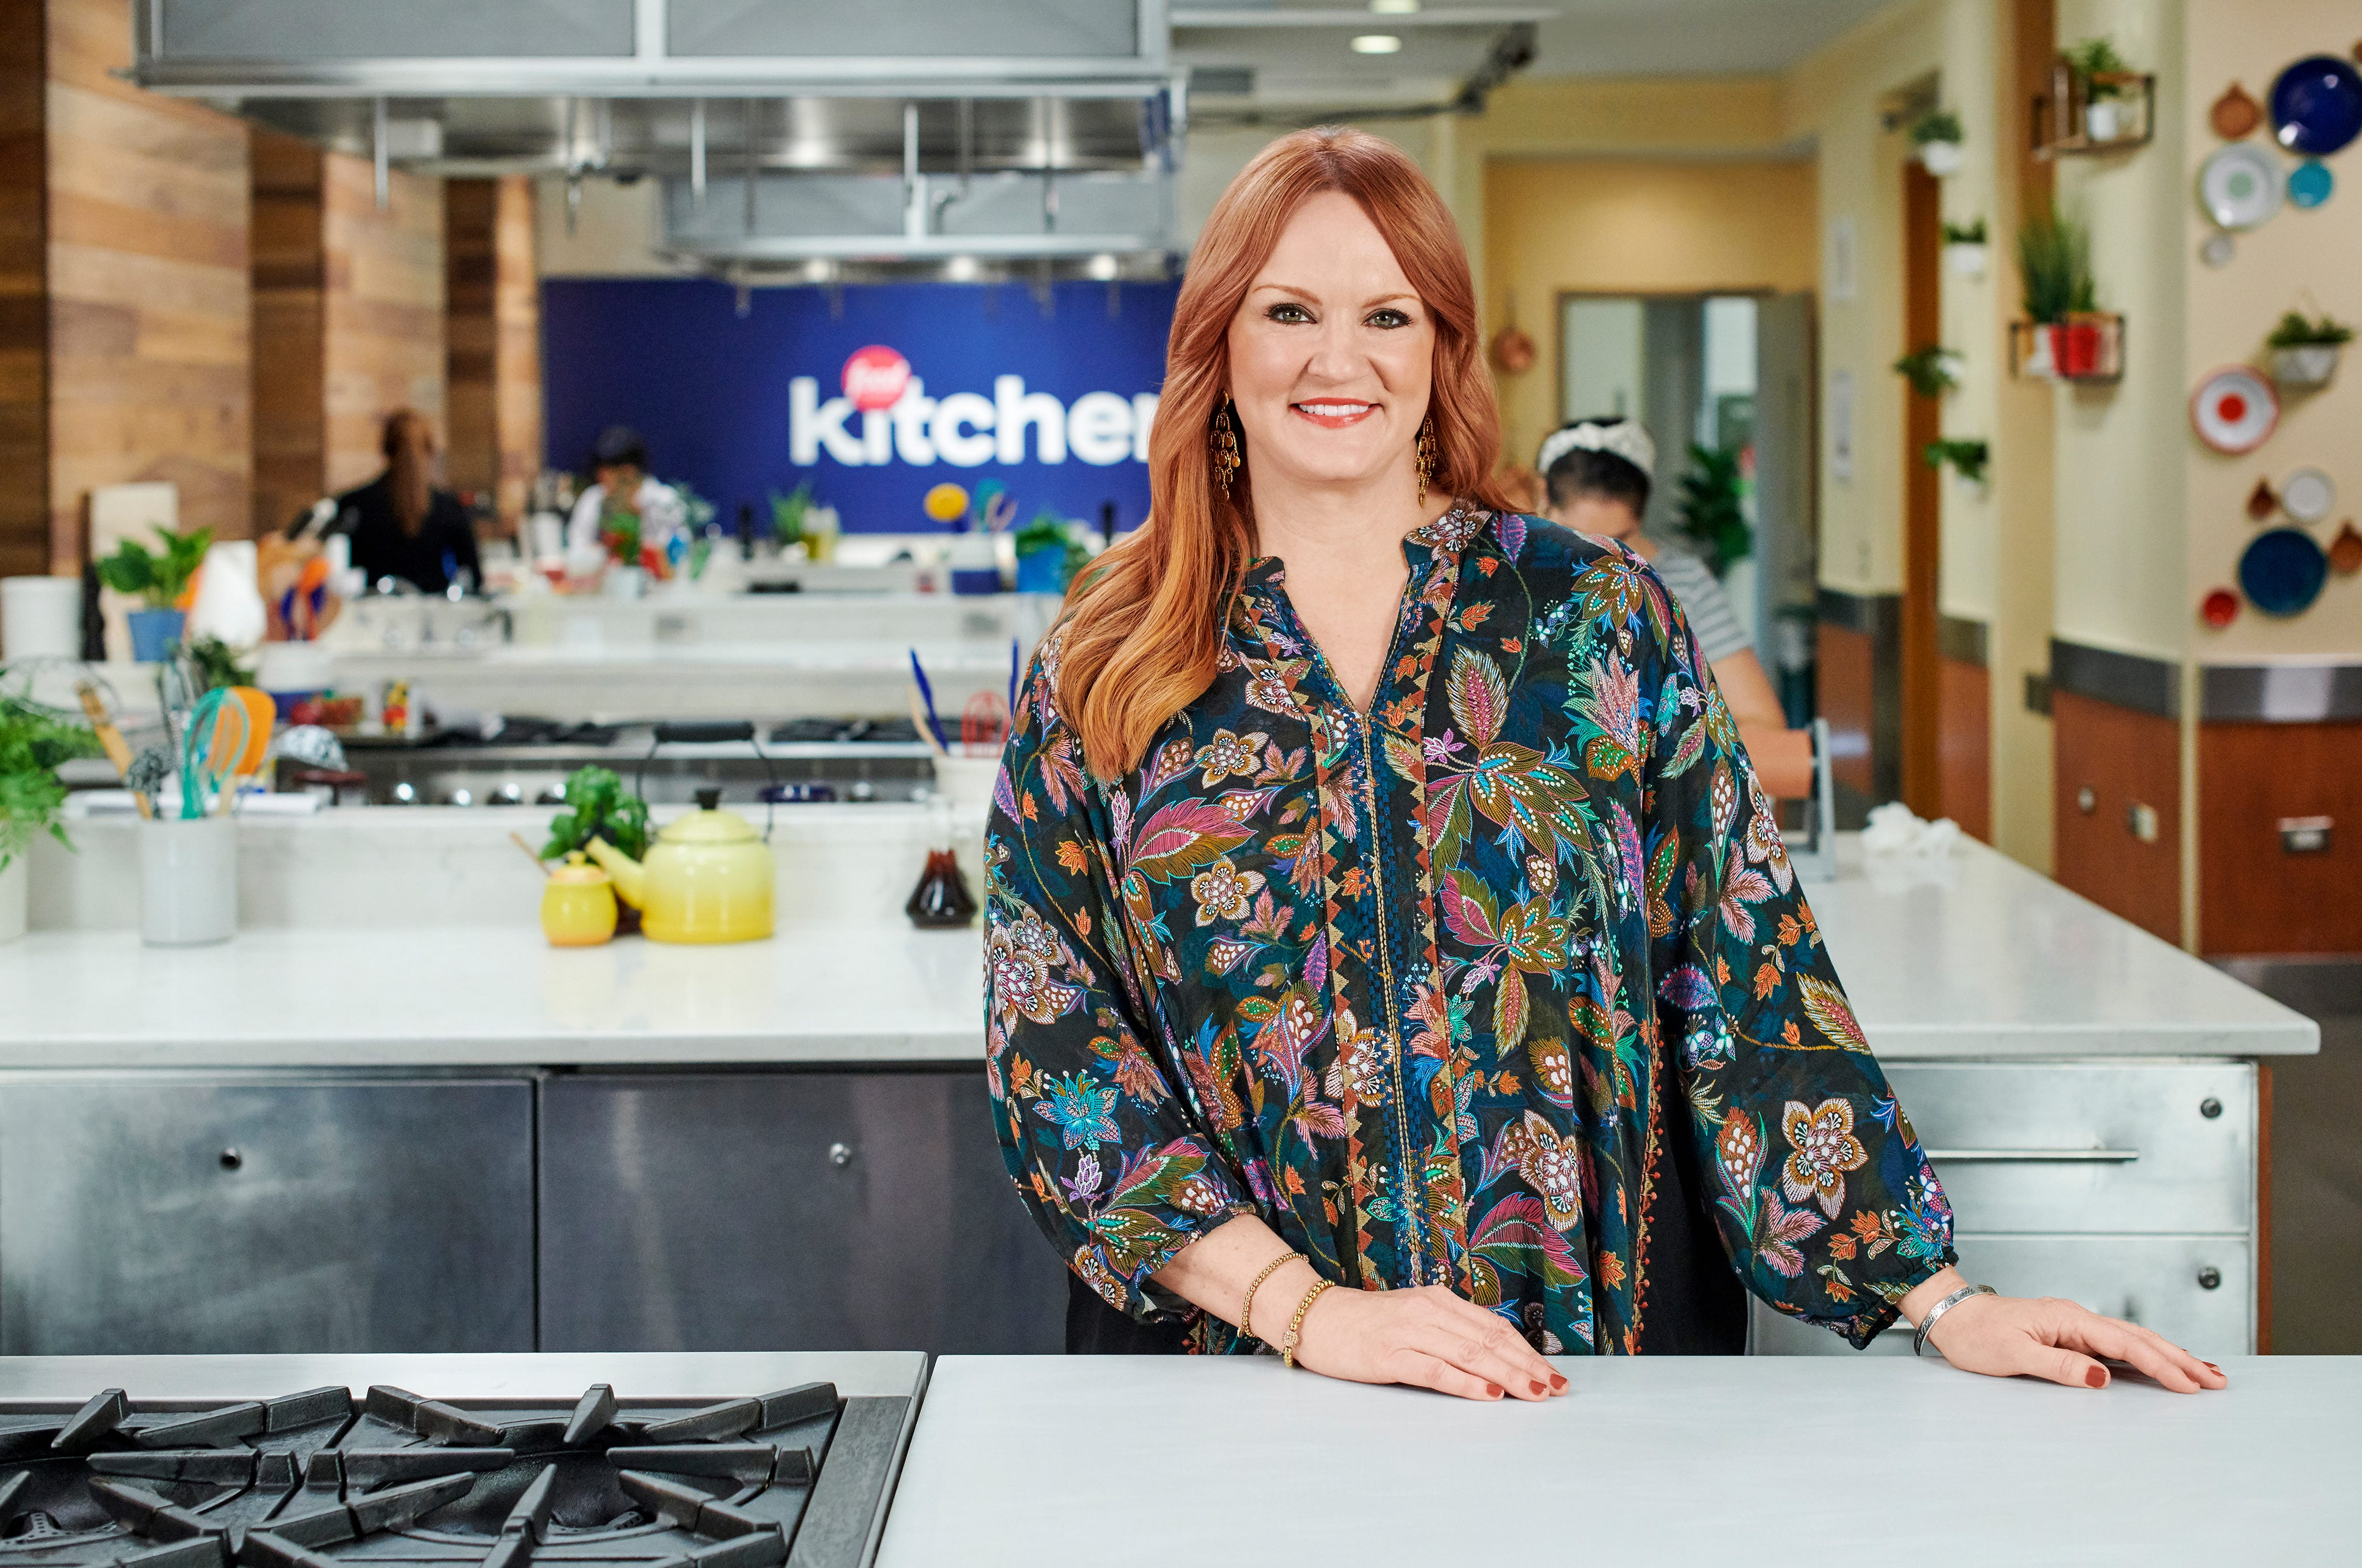 Food Network Kitchen app: Will it